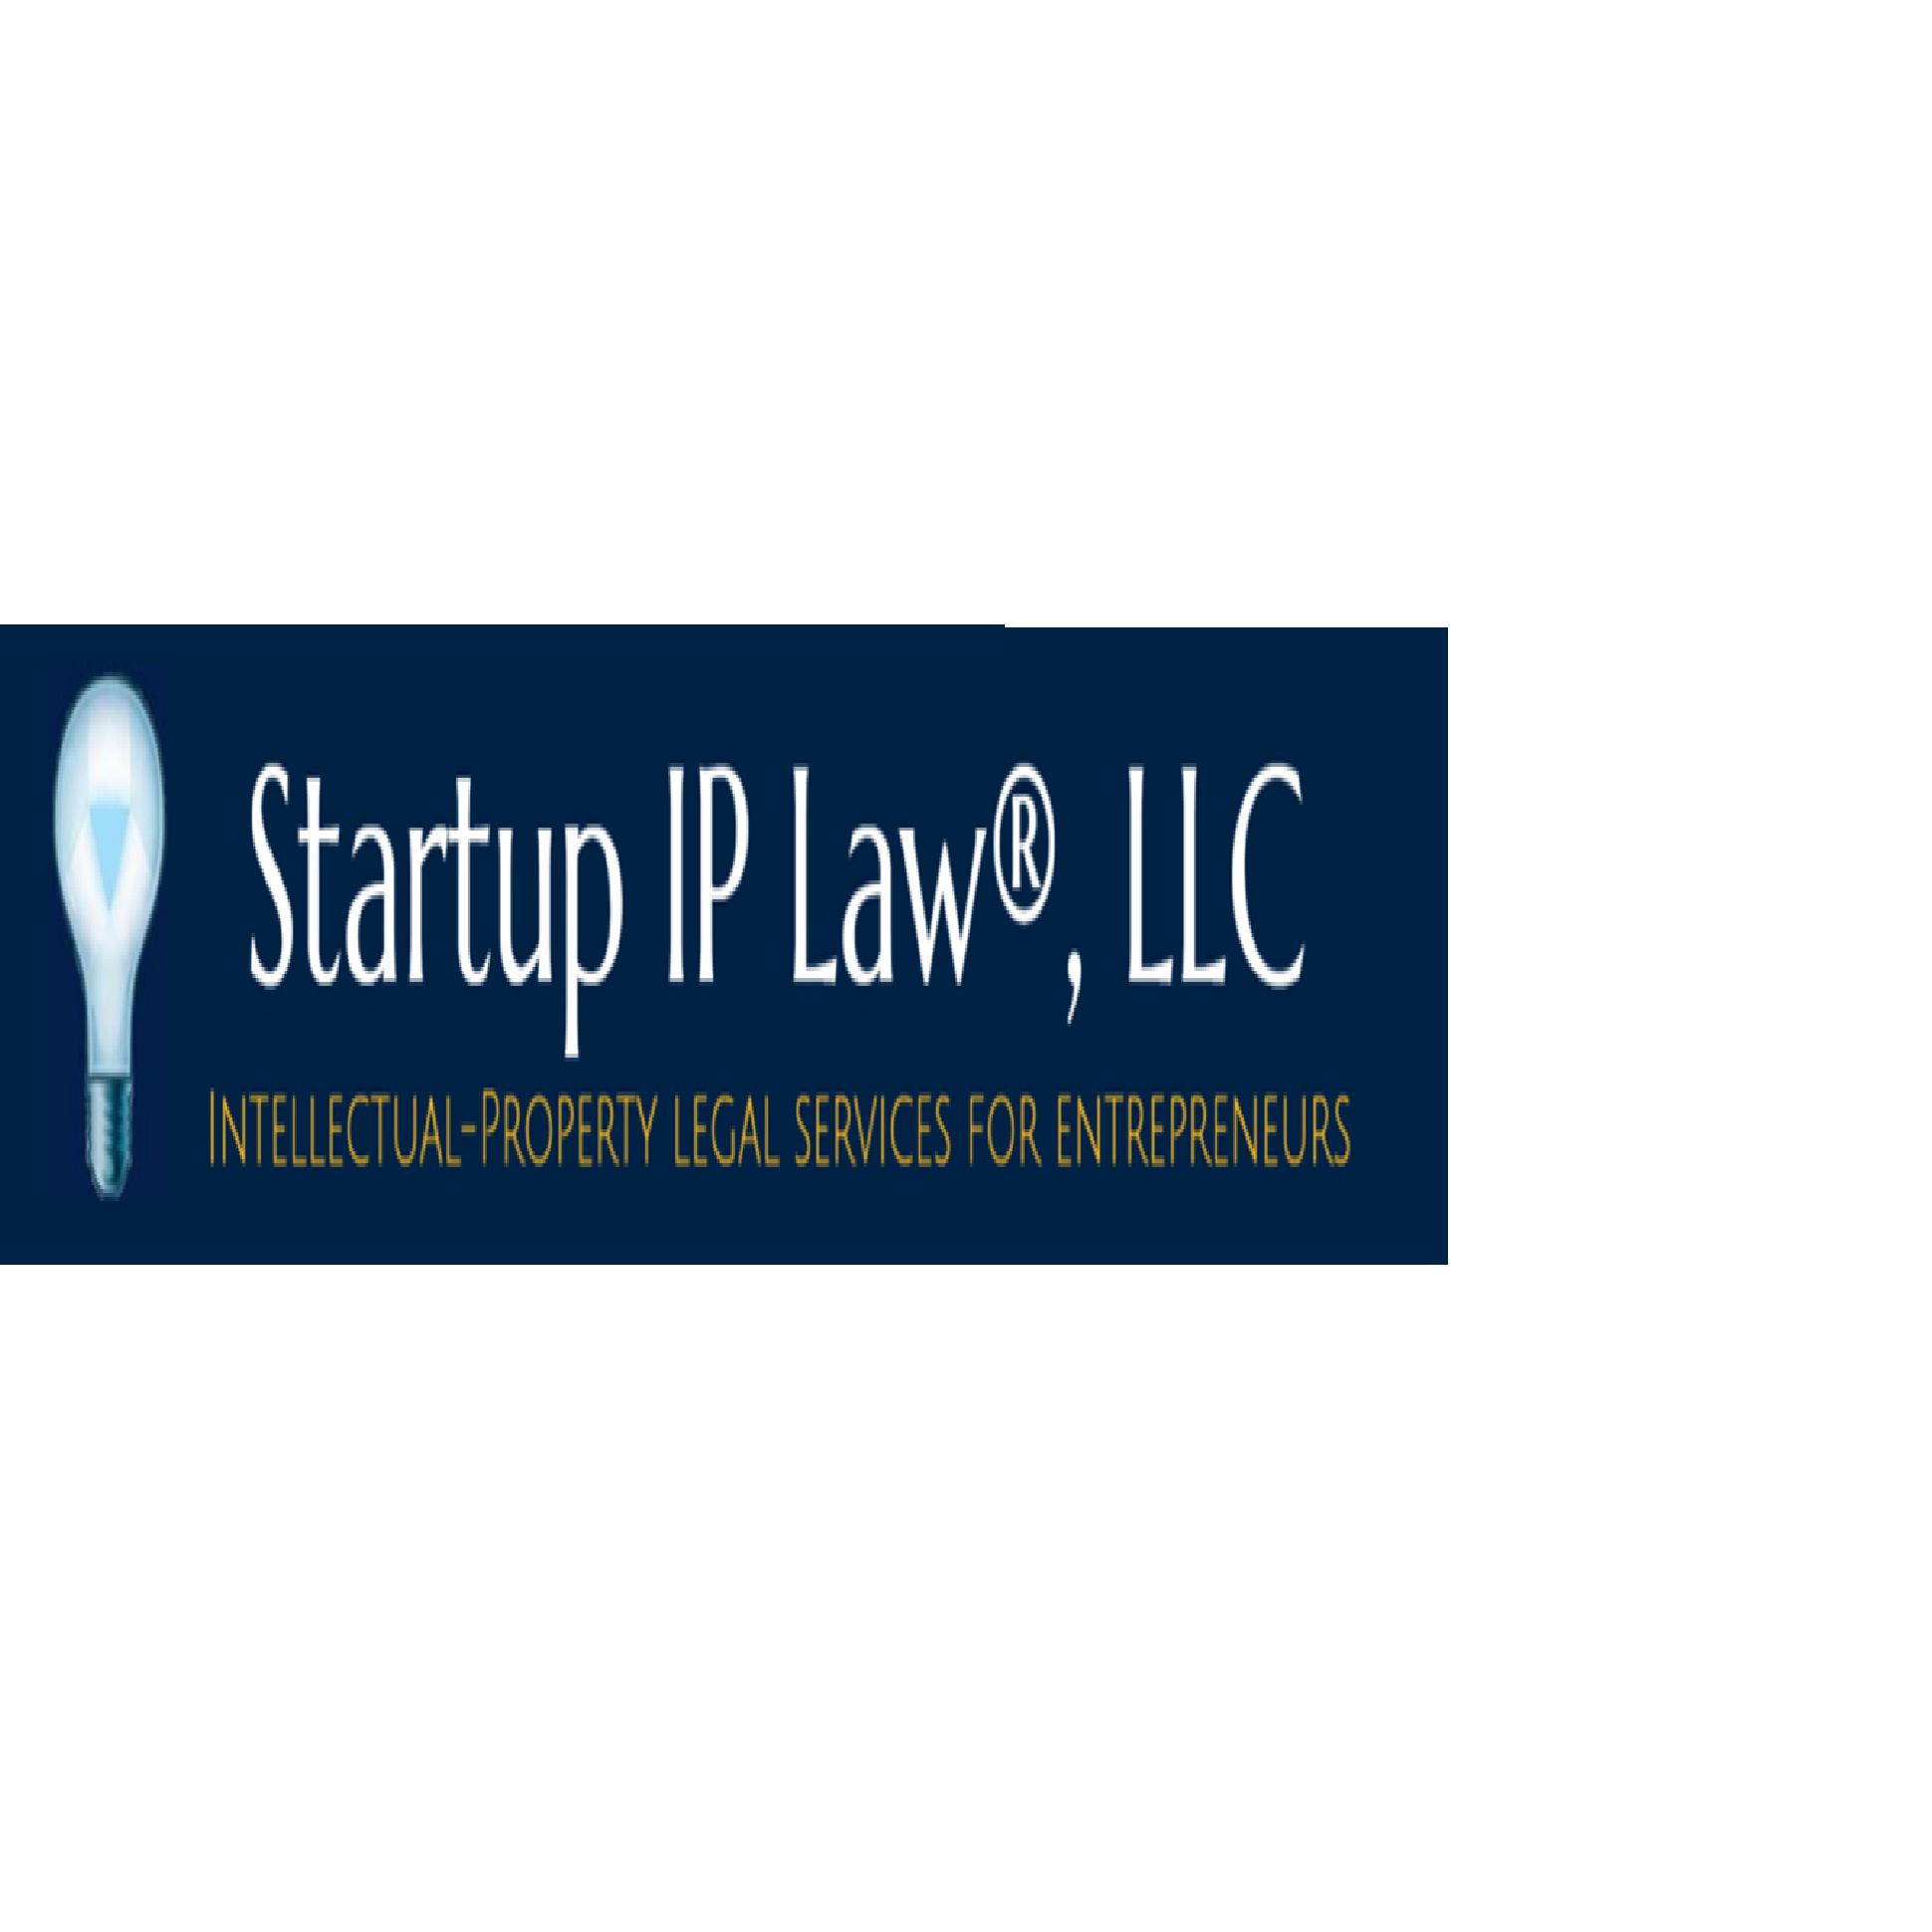 Startup IP Law, LLC